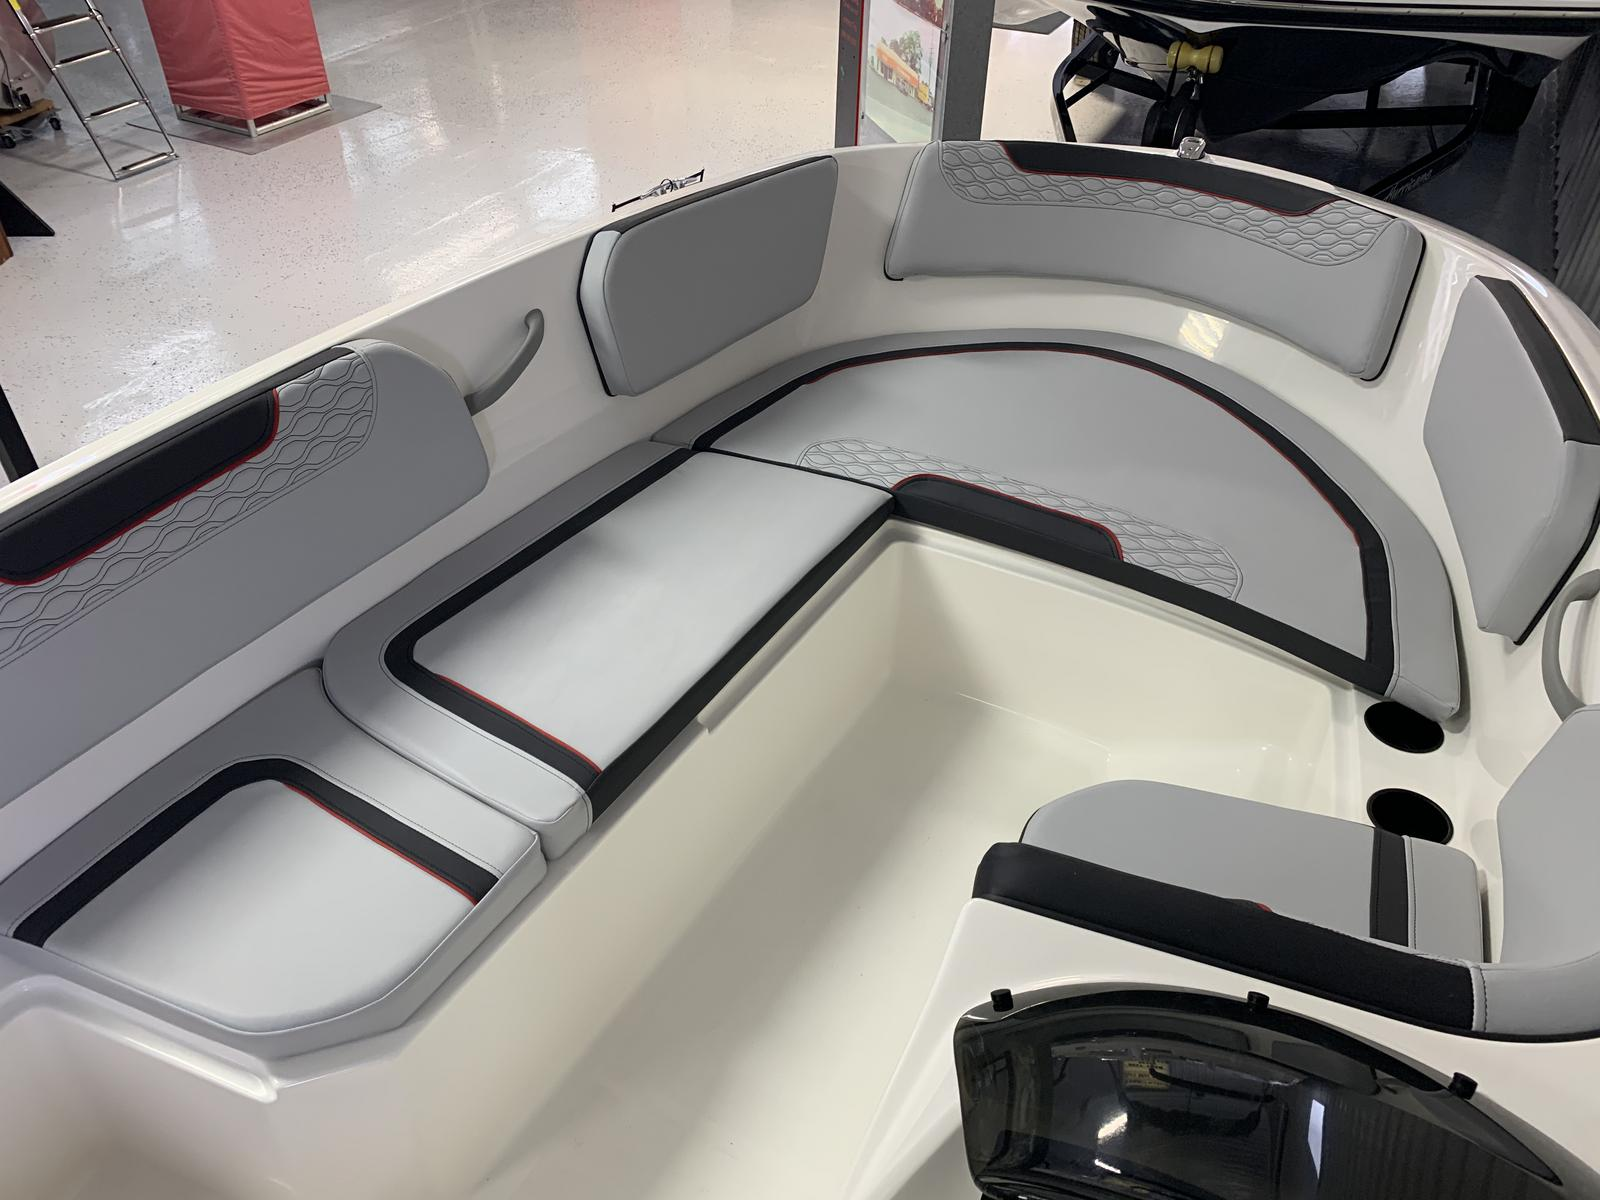 2021 Bayliner boat for sale, model of the boat is M-15 & Image # 4 of 4